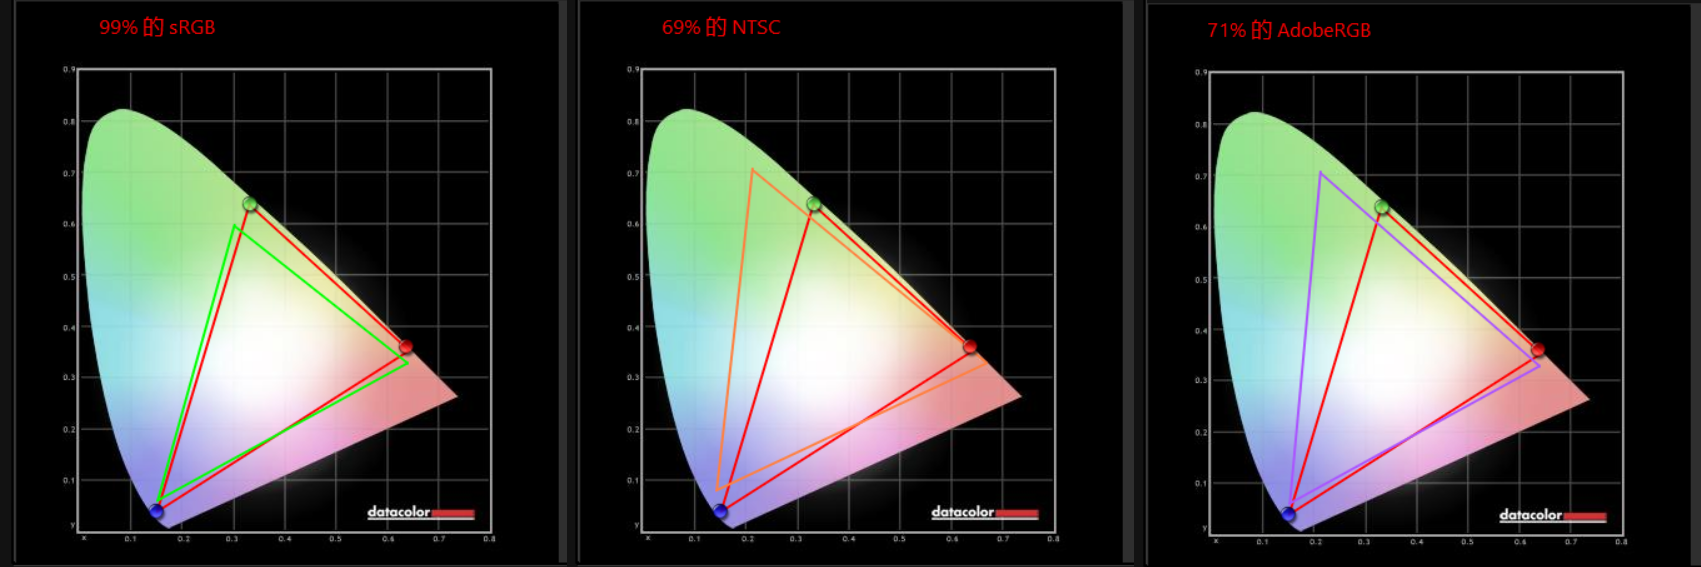 Lenovo Ideapad 720s screen test